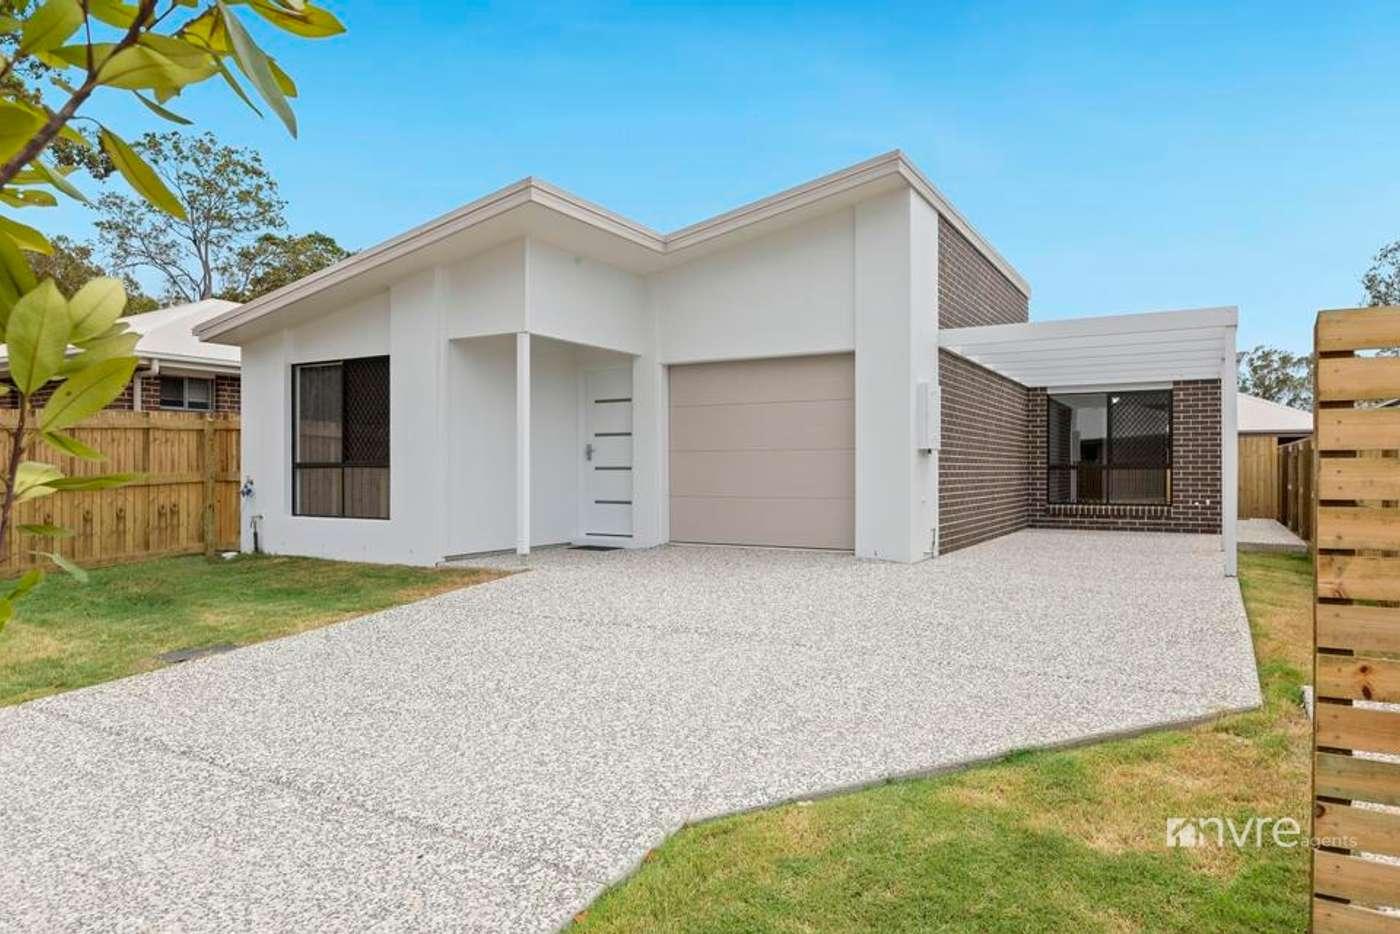 Main view of Homely semiDetached listing, 32 Elandra Street, Burpengary QLD 4505